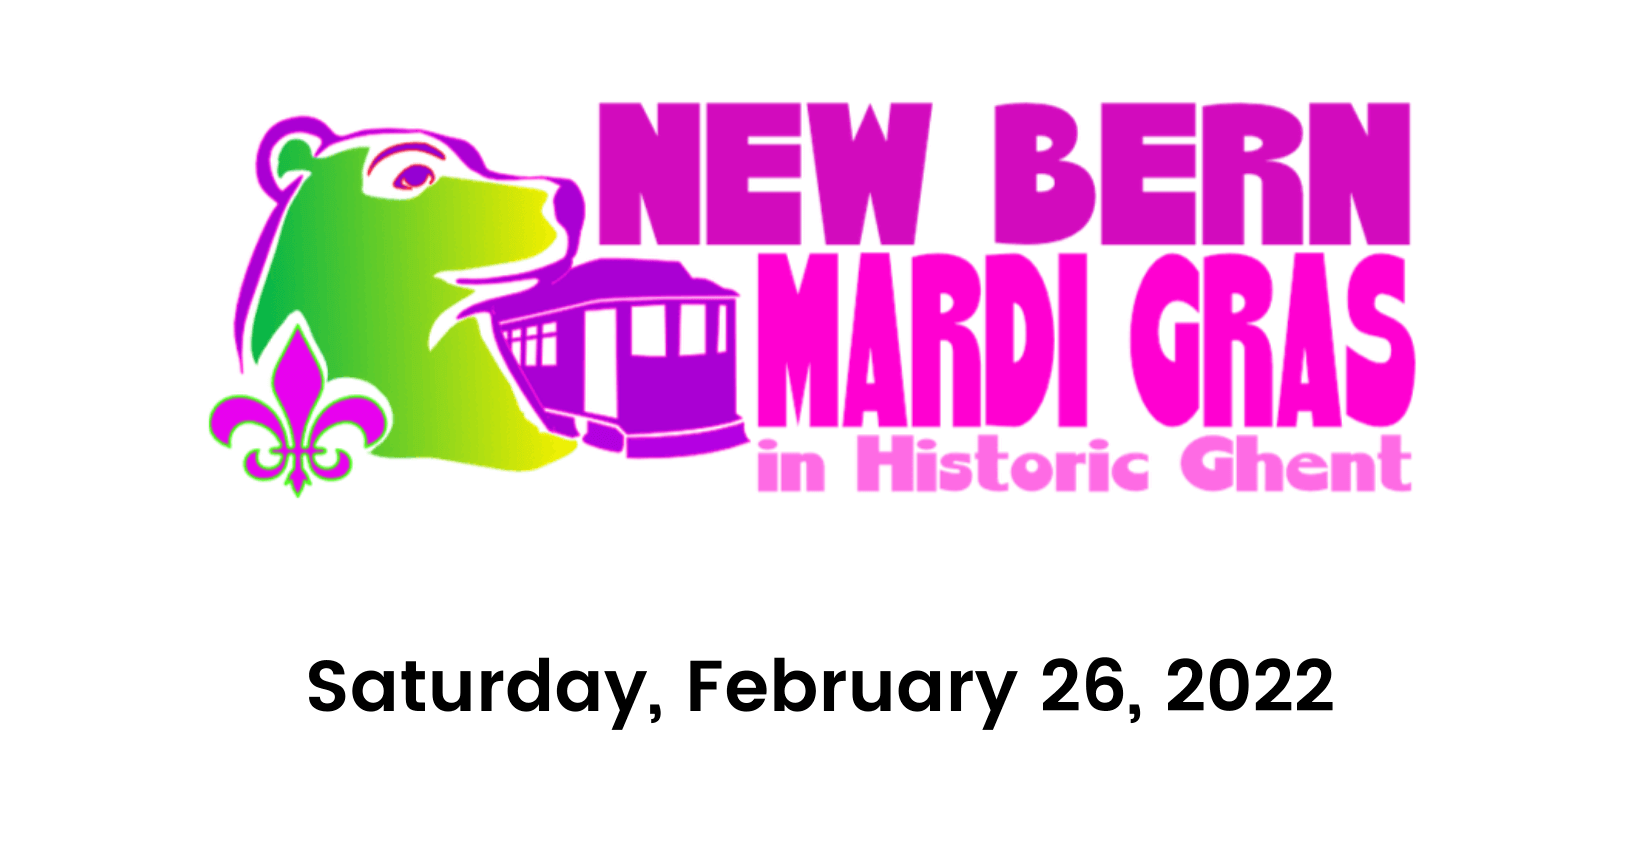 Ghent-New Bern Mardi Gras logo 2022 and date